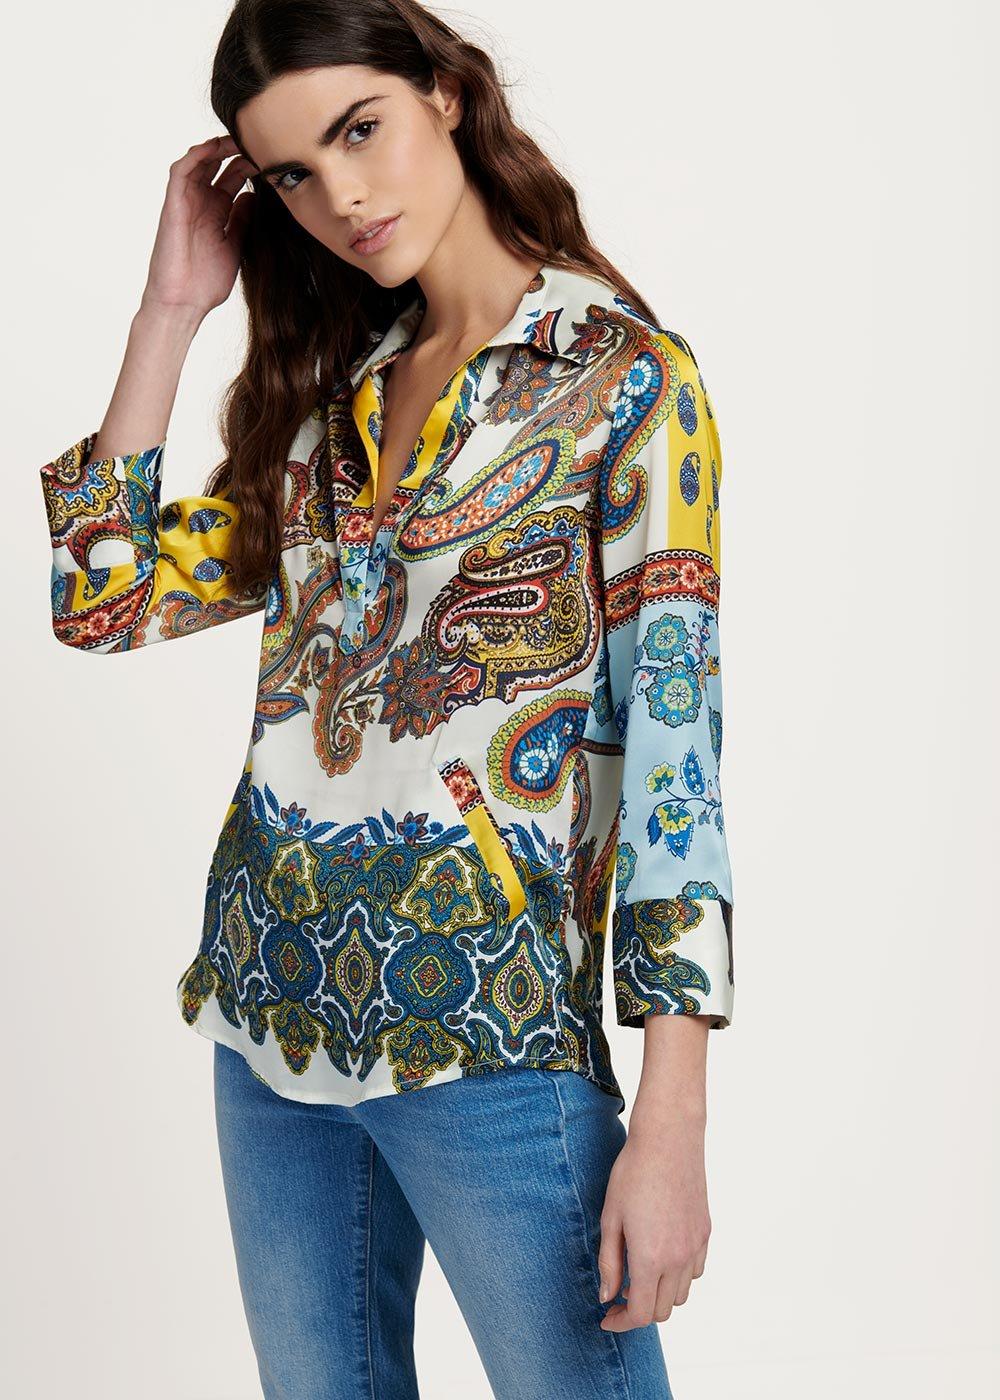 Angela blouse with coloured cashmere pattern - White / Nettuno Fantasia - Woman